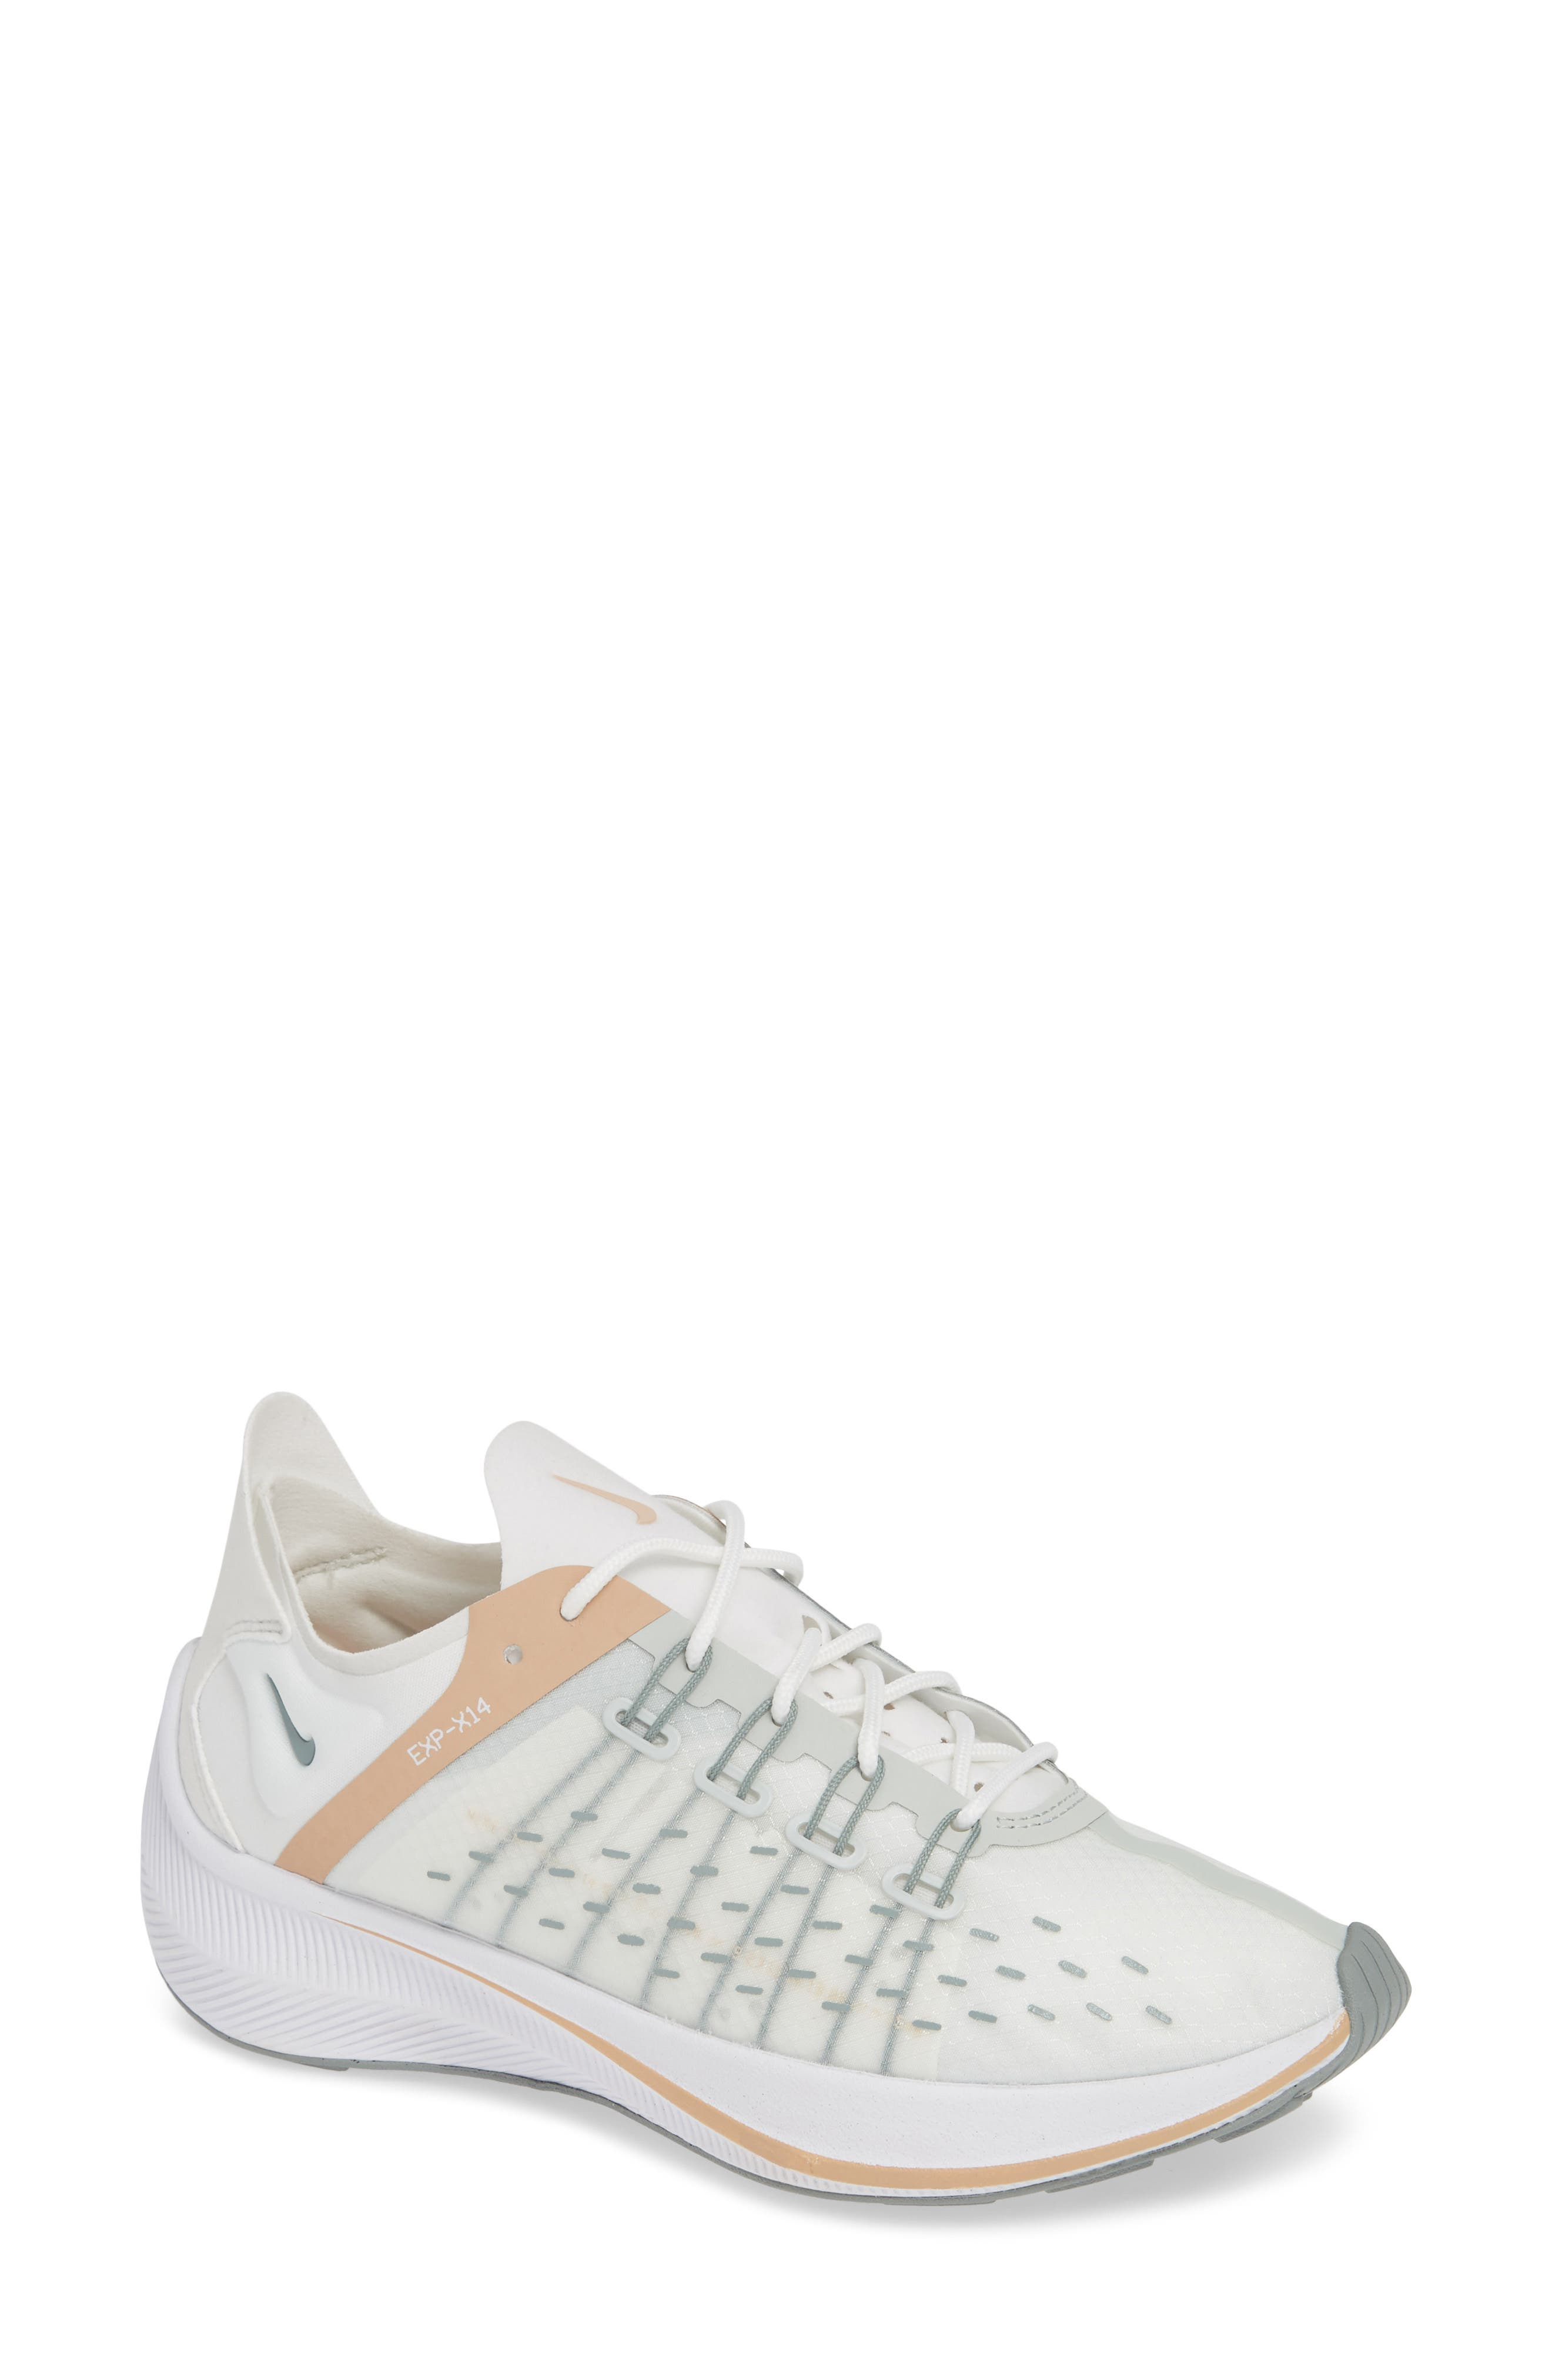 EXP-X14 Sneaker,                             Main thumbnail 1, color,                             SUMMIT WHITE/ LIGHT SILVER